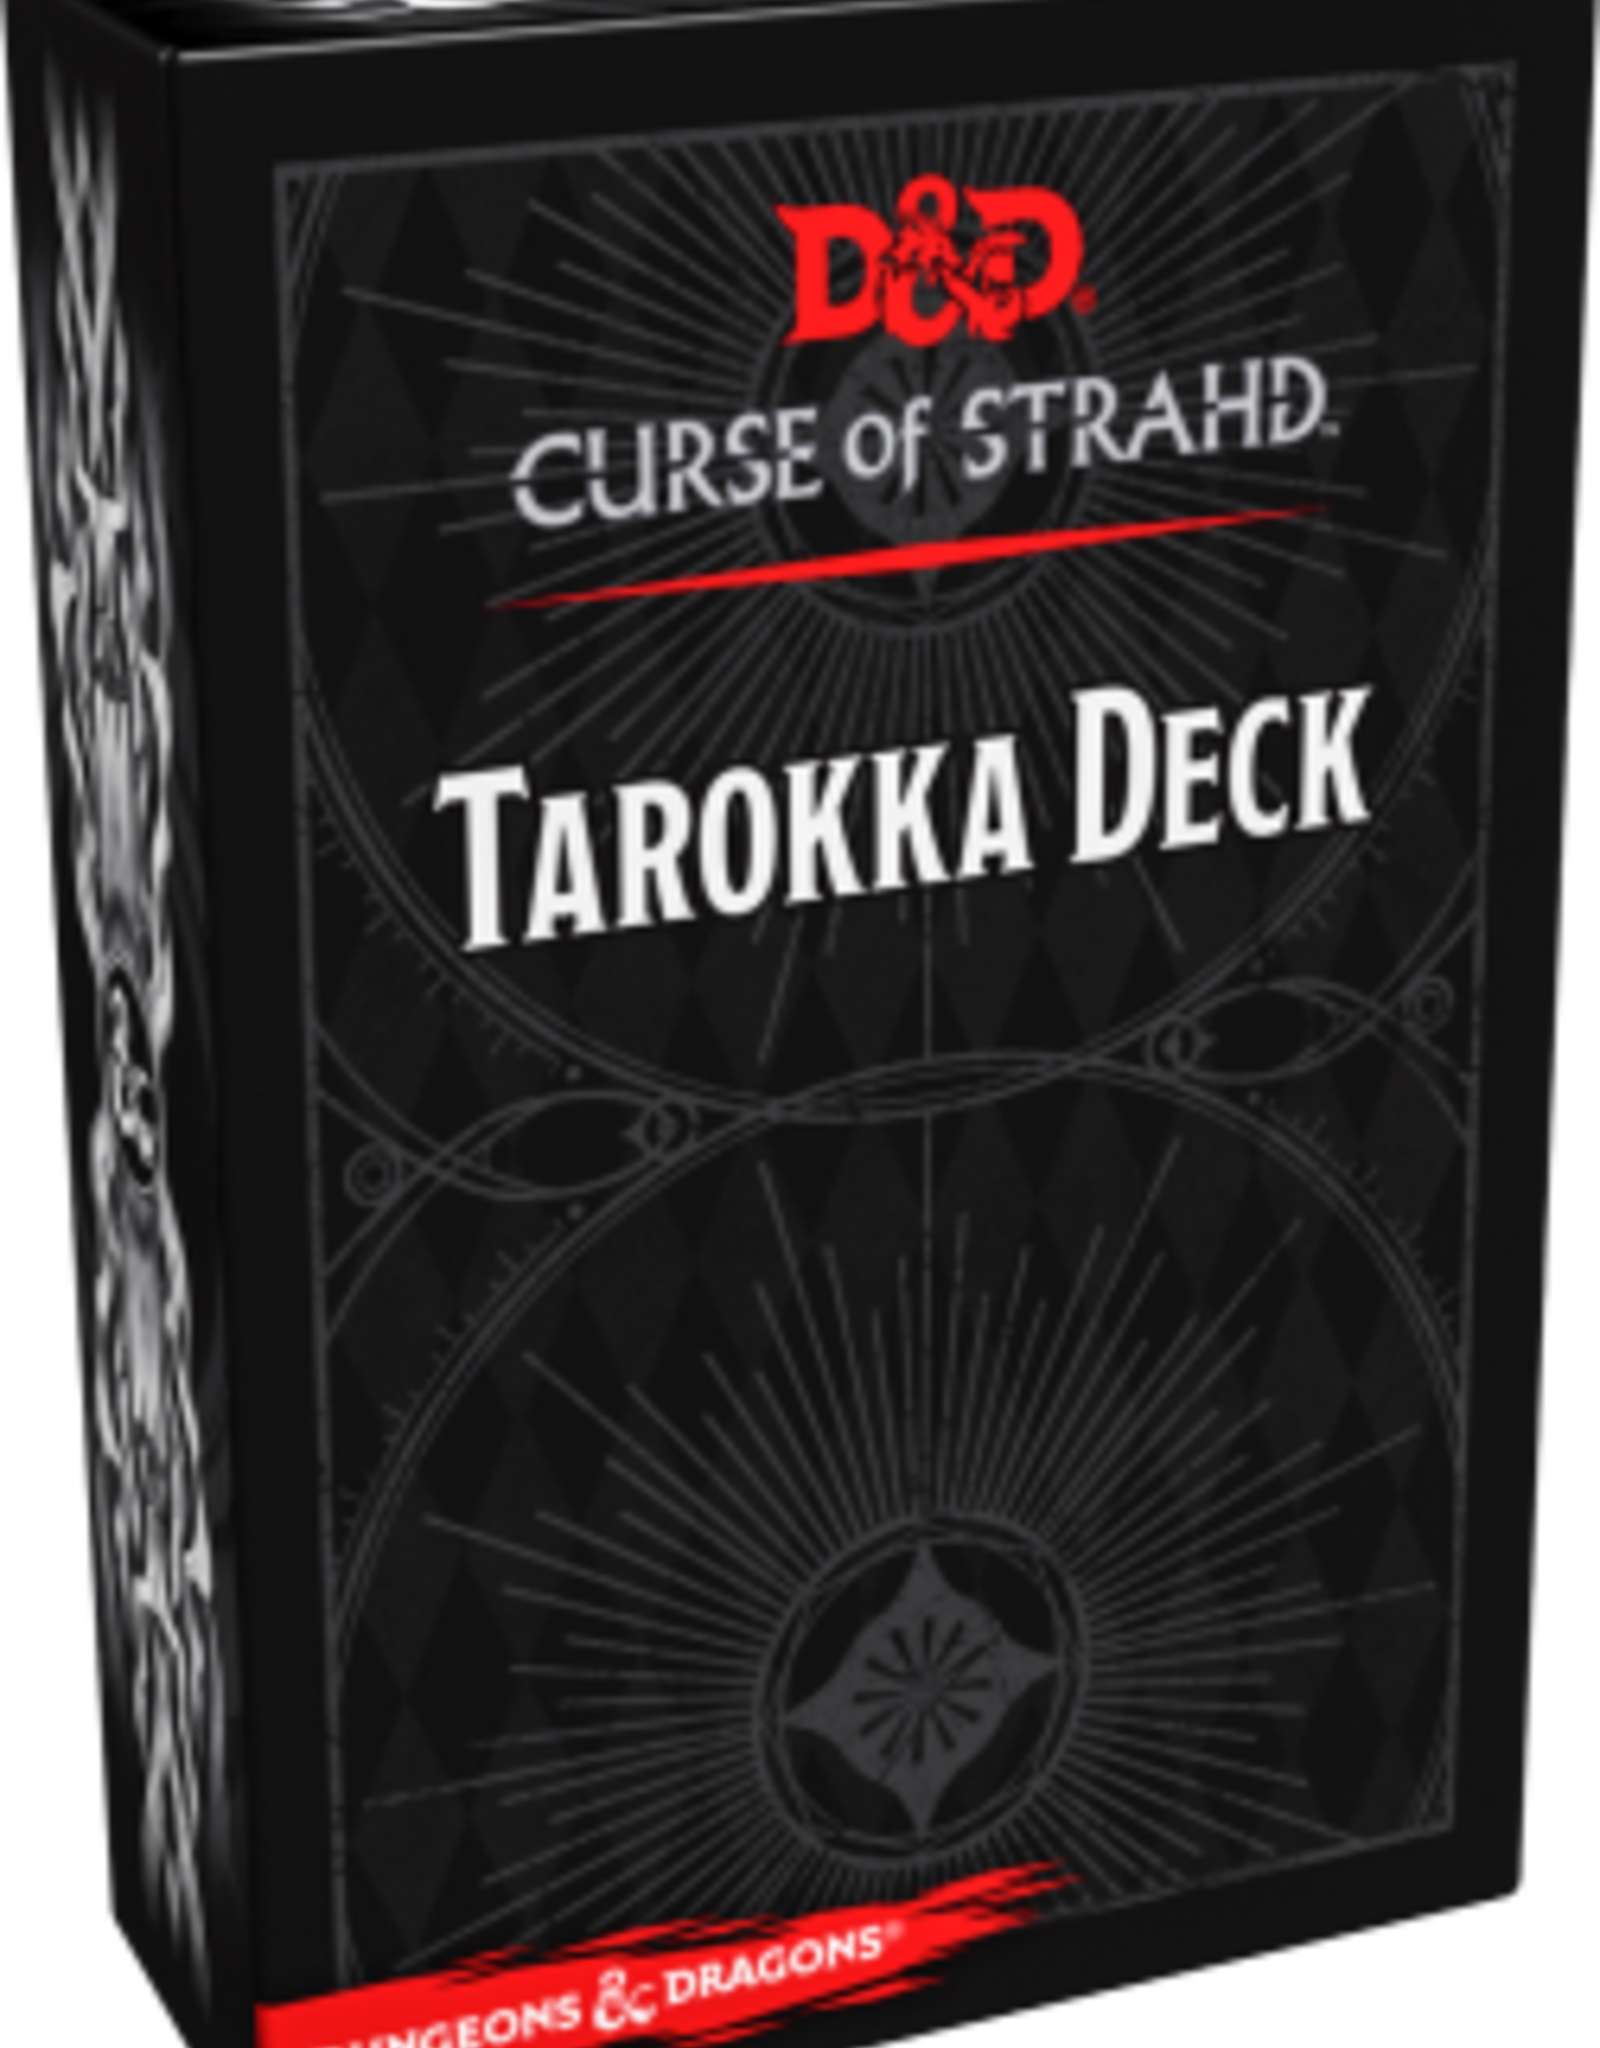 Wizards of the Coast Dungeons & Dragons Curse of Strahd Tarokka Deck